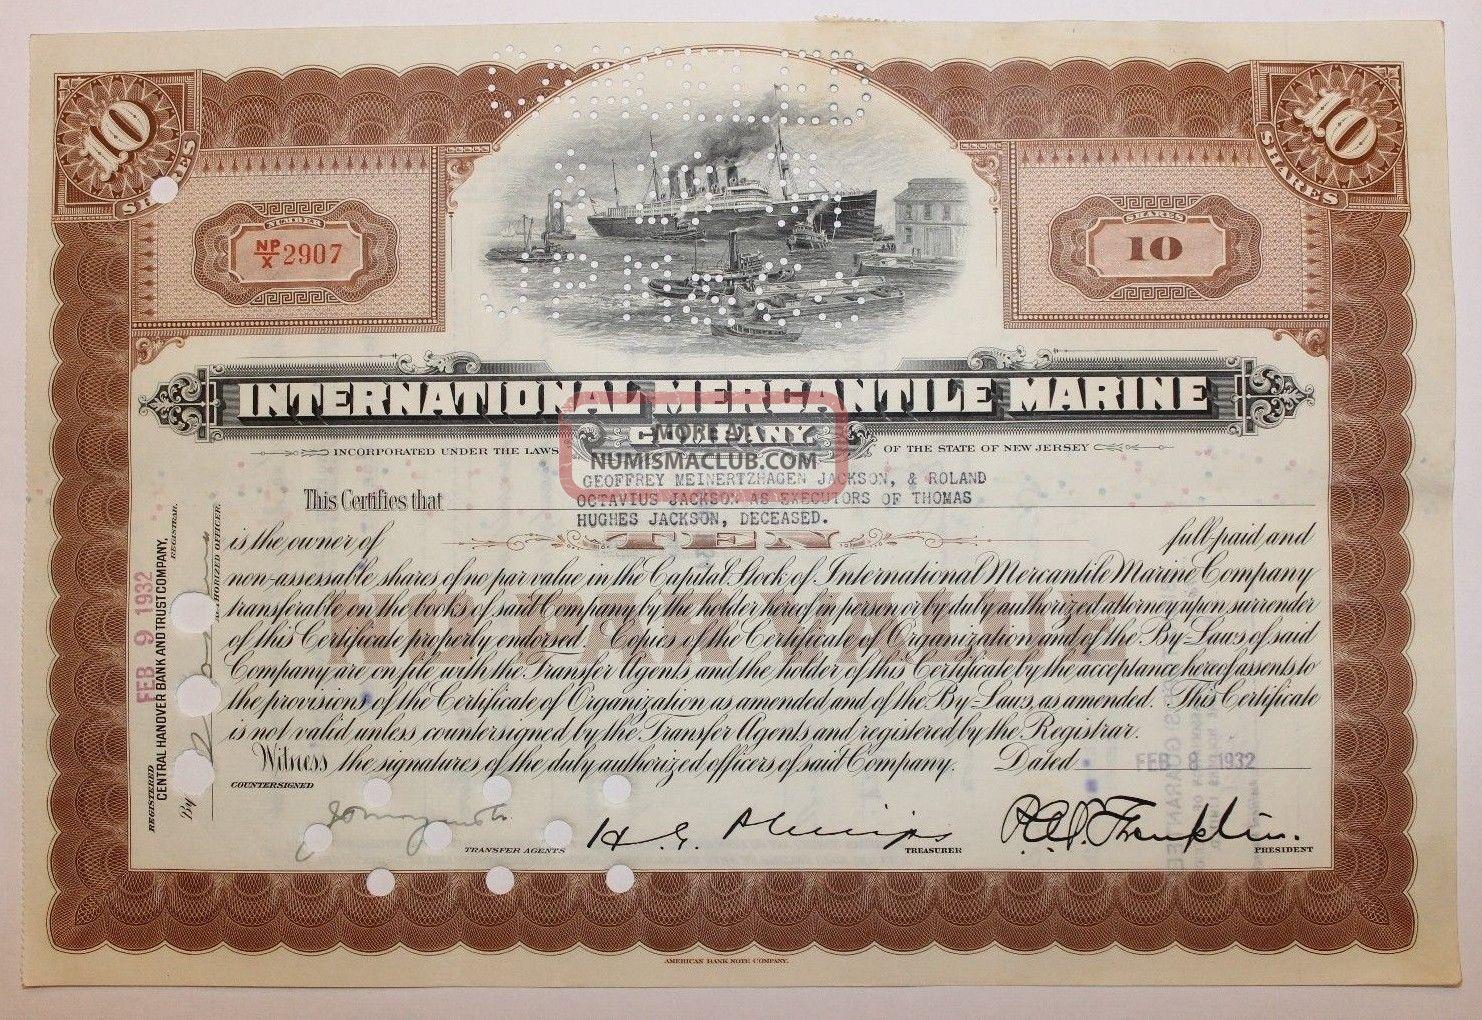 1932 International Mercantile Marine Co.  Stock Certificate Titanic Type 2 Brown Transportation photo